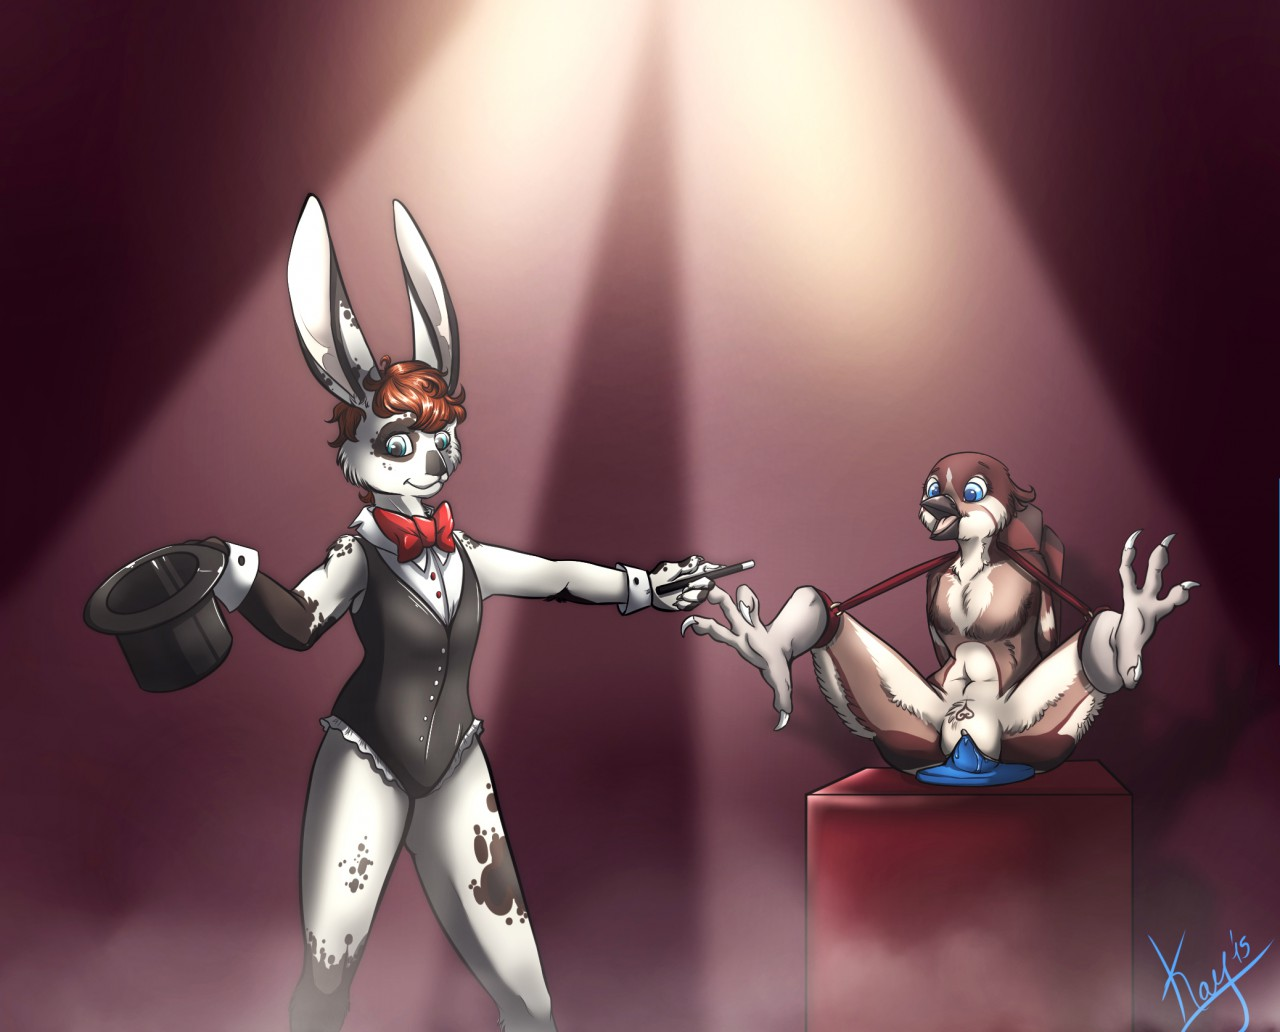 bdsm norge dildo rabbit